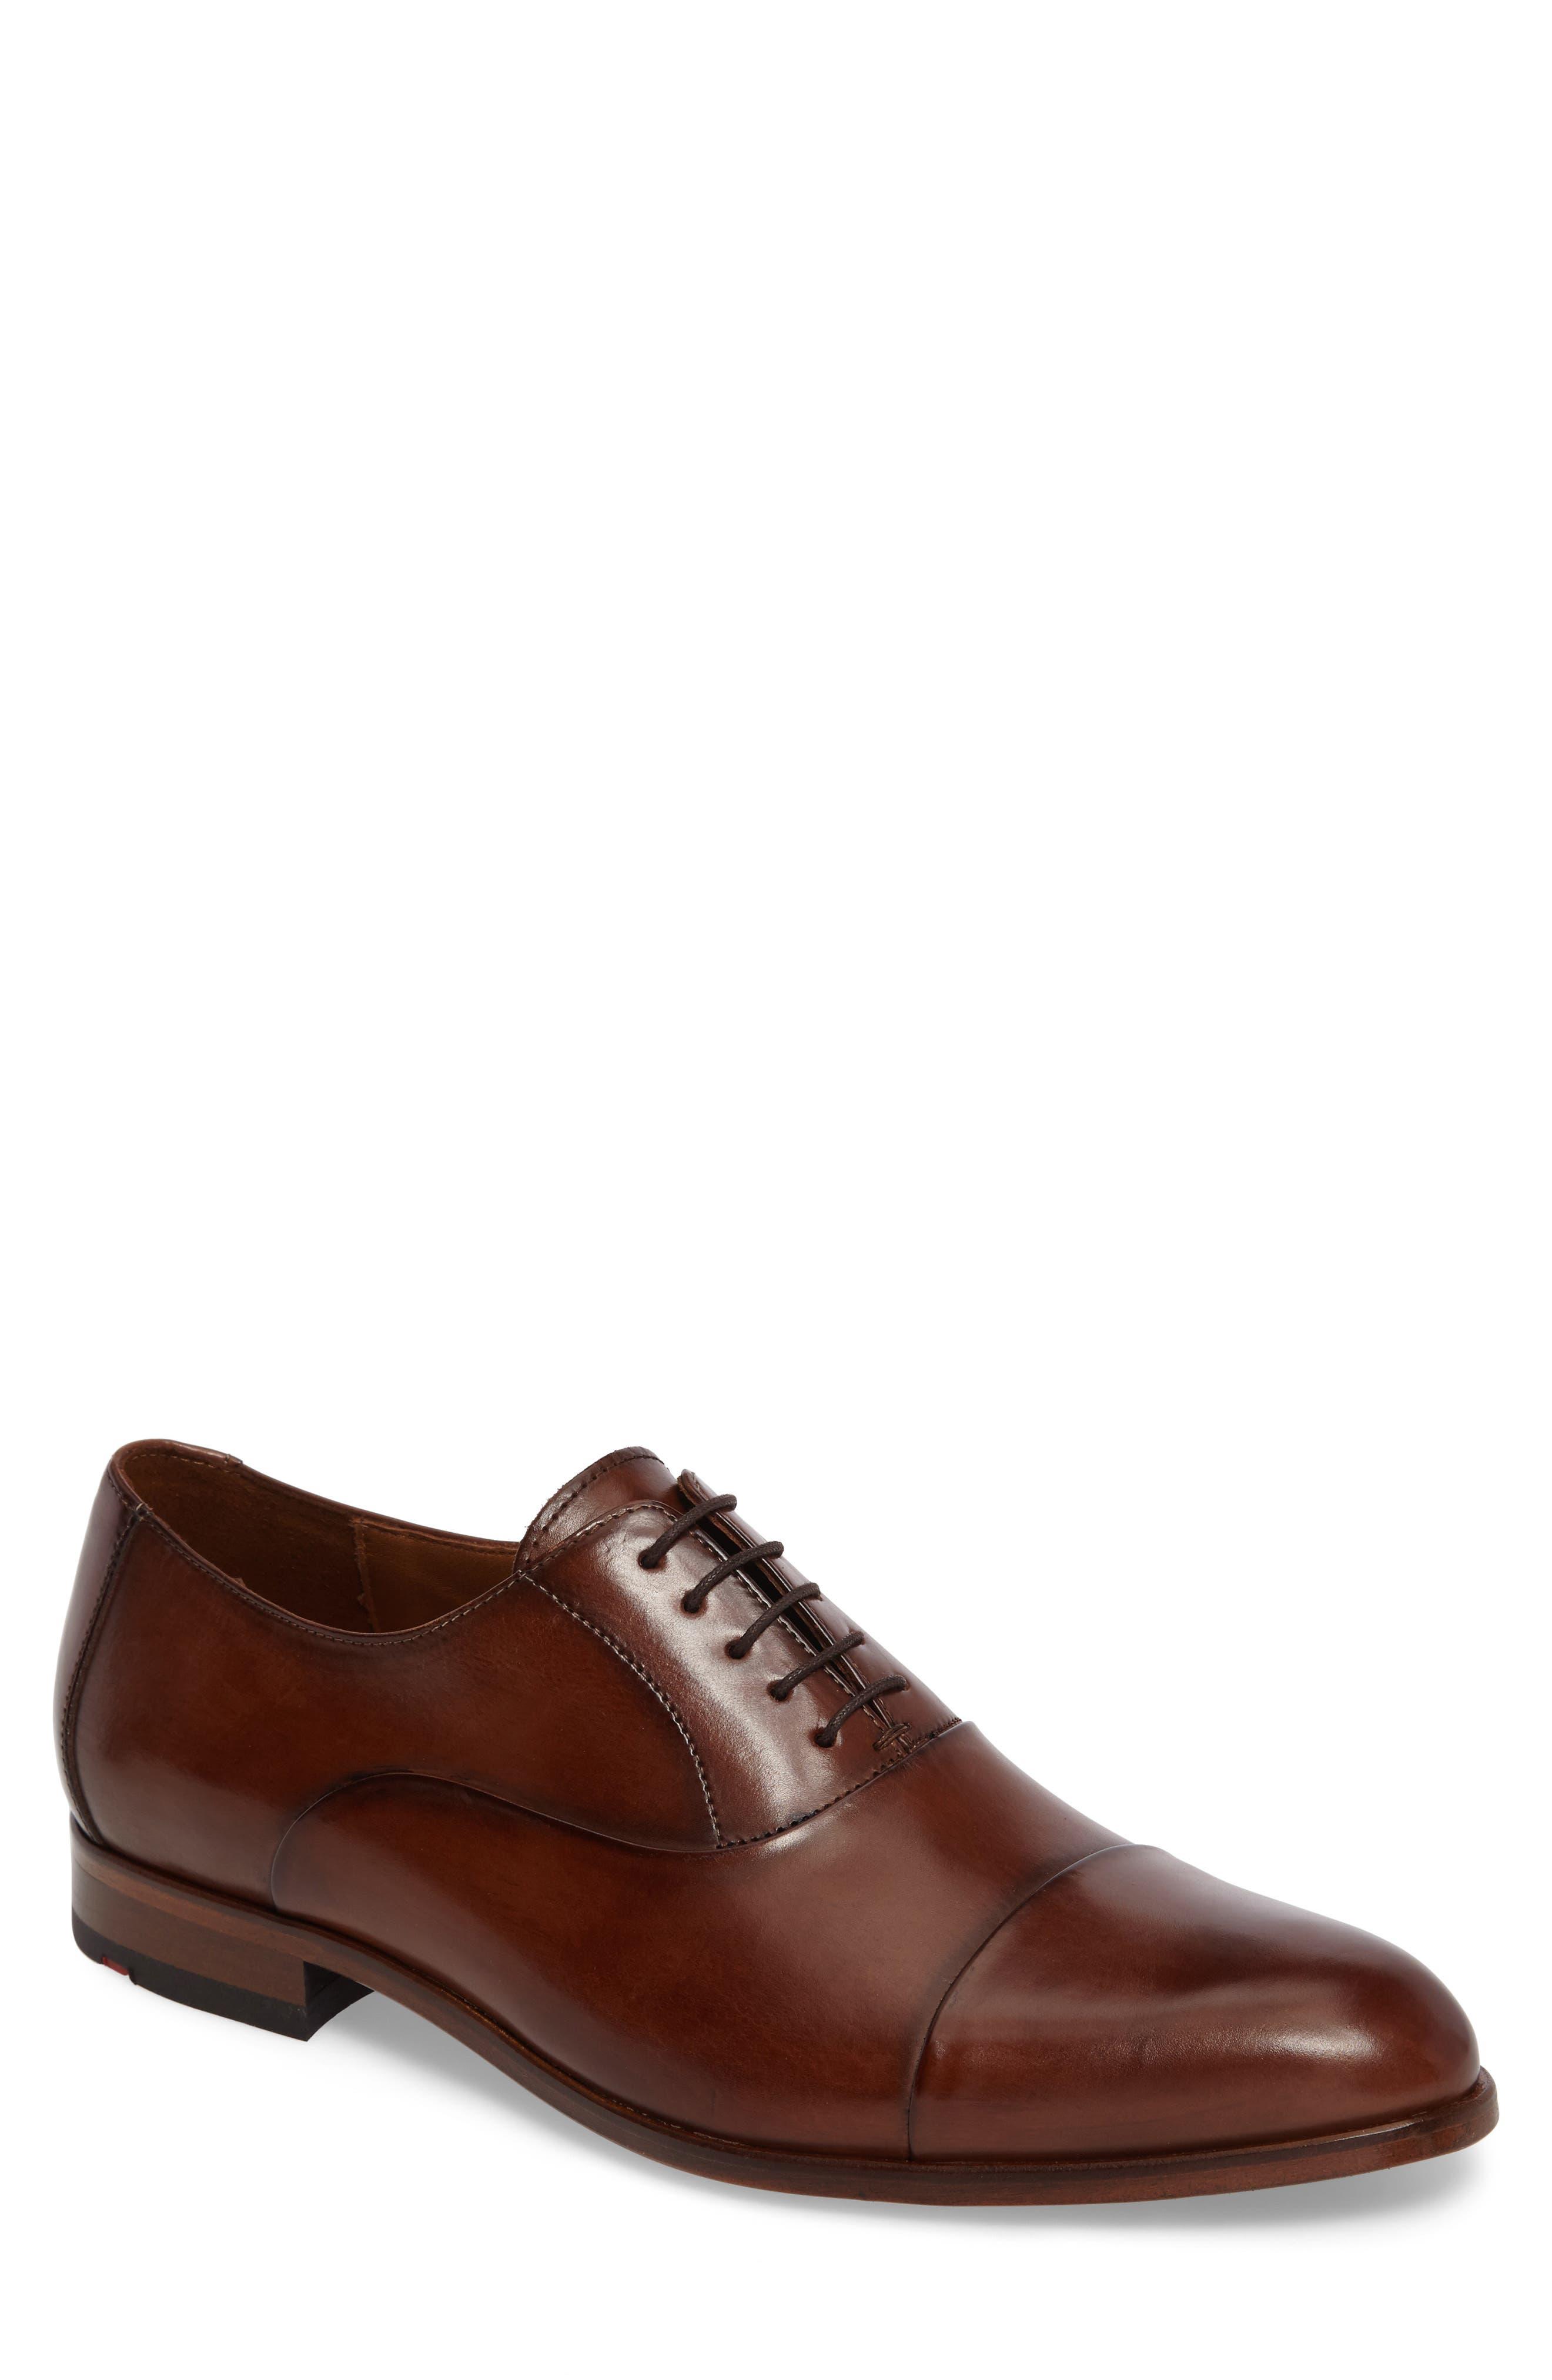 Malik Cap-Toe Oxford,                             Main thumbnail 1, color,                             Brown Leather